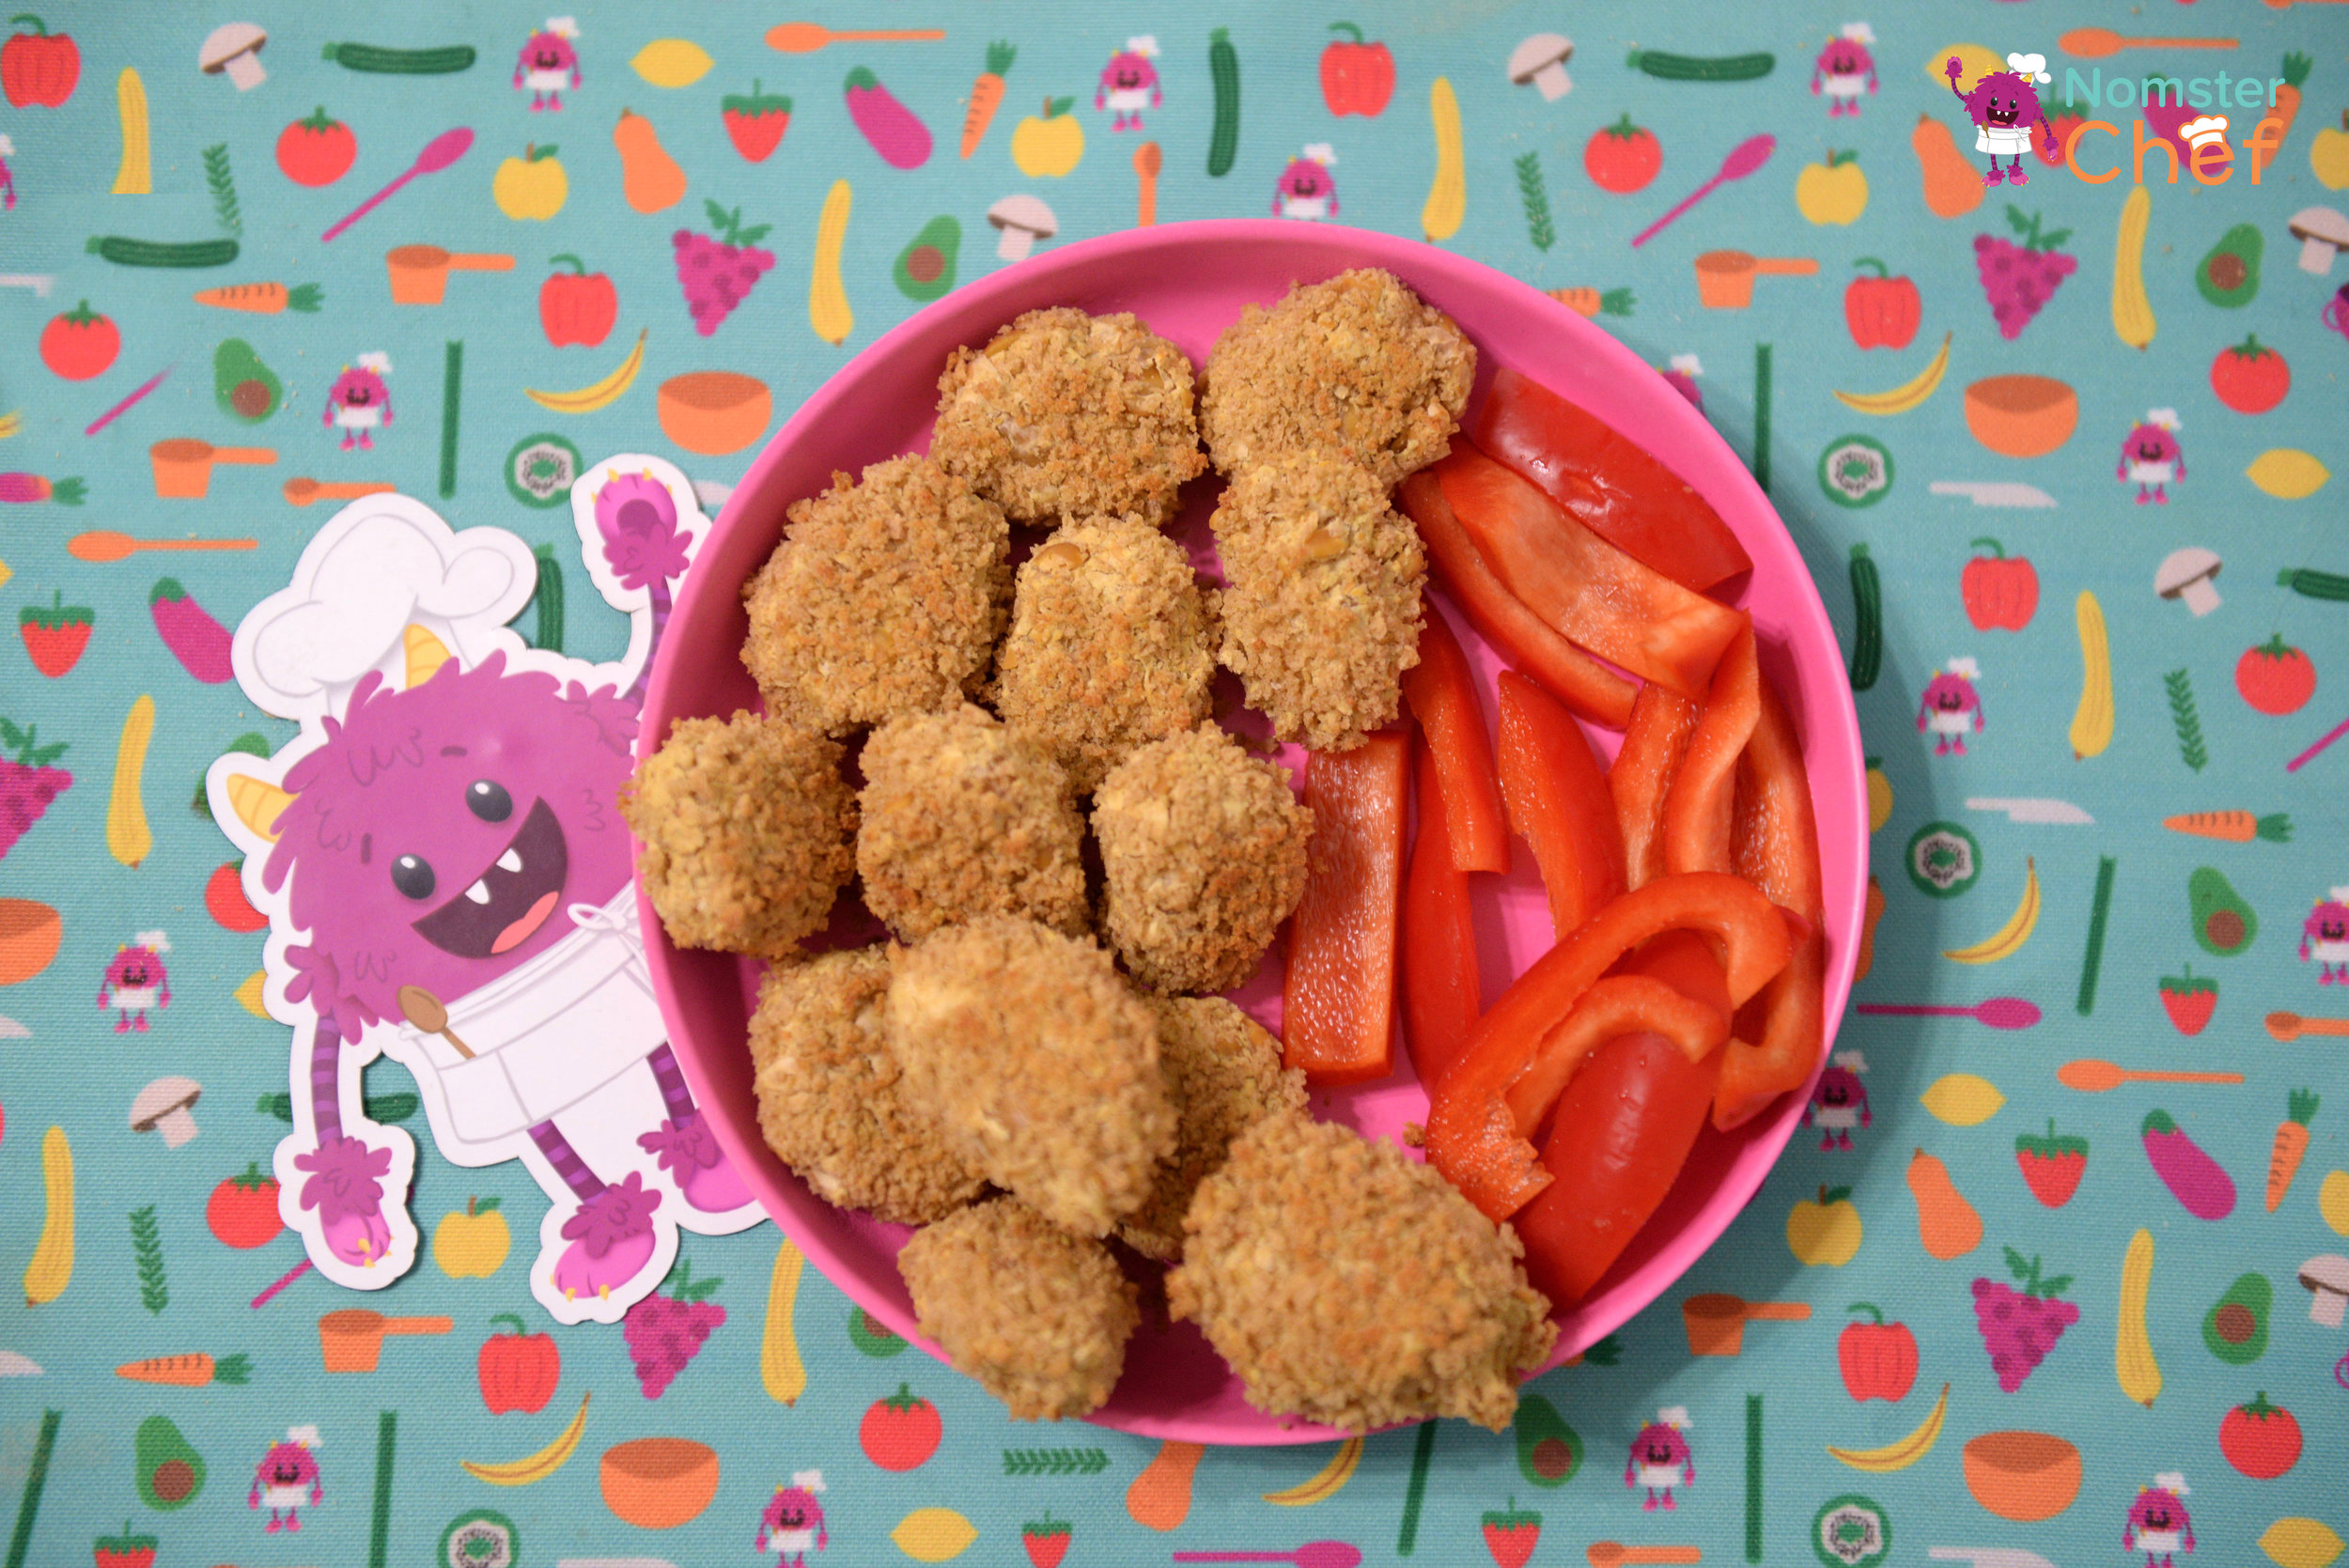 Kitchen_Vocabulary_Chickpea_Nuggets_063.jpg